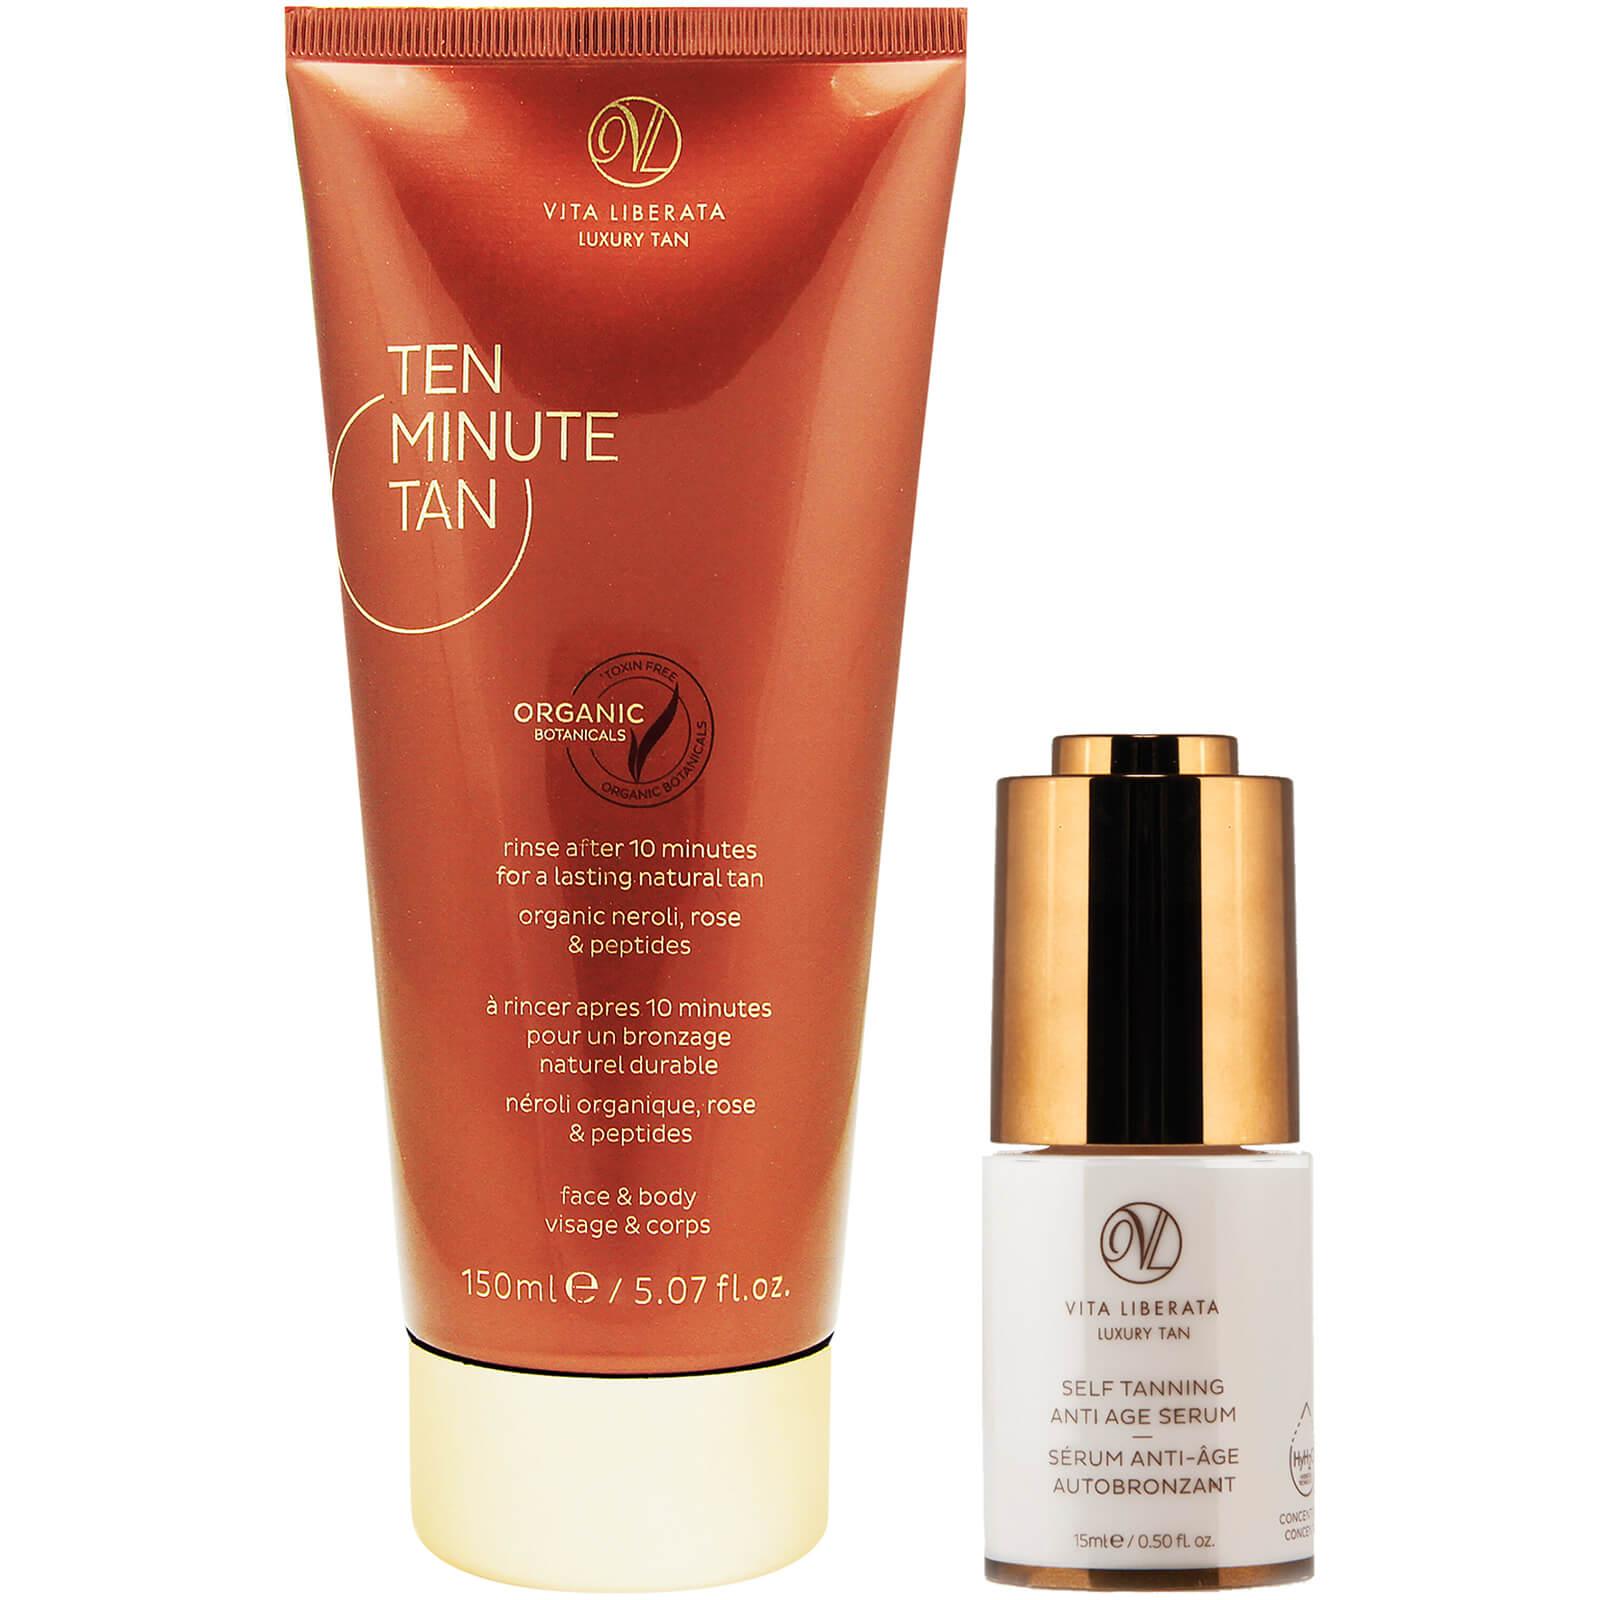 vita liberata ten minute tan & serum set (worth $73)